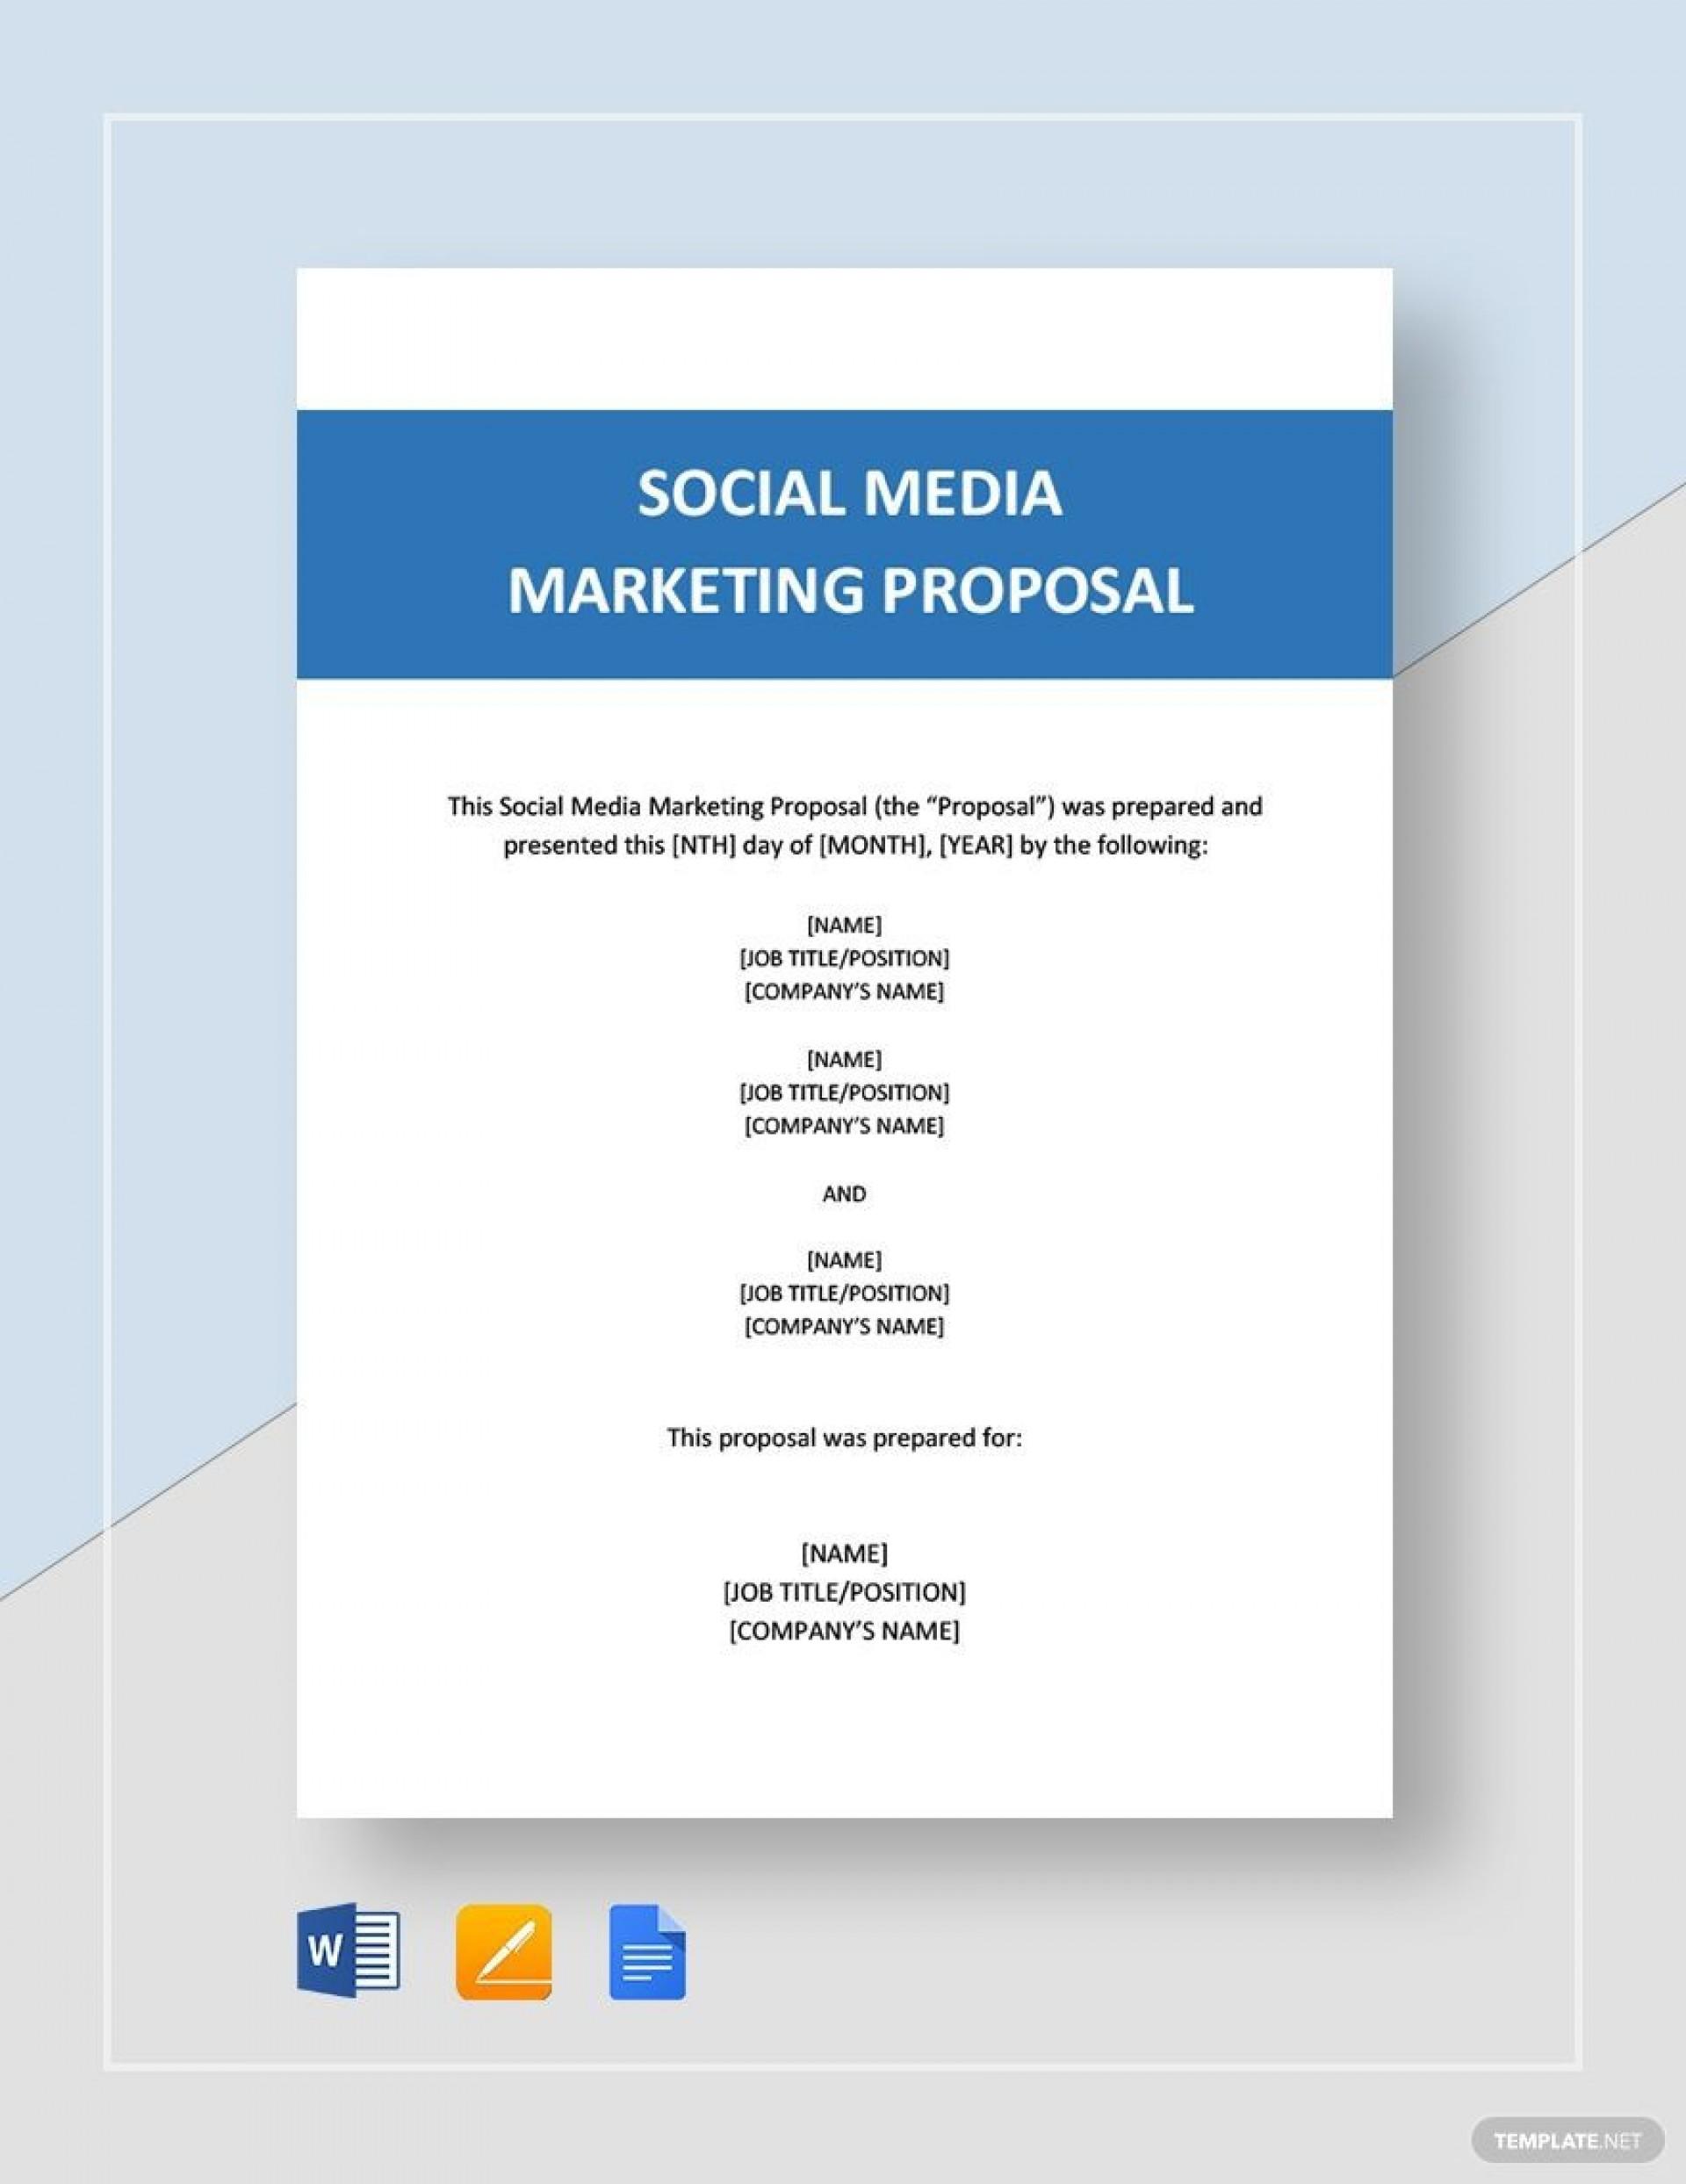 004 Unforgettable Social Media Marketing Proposal Template Word Design  Plan1920